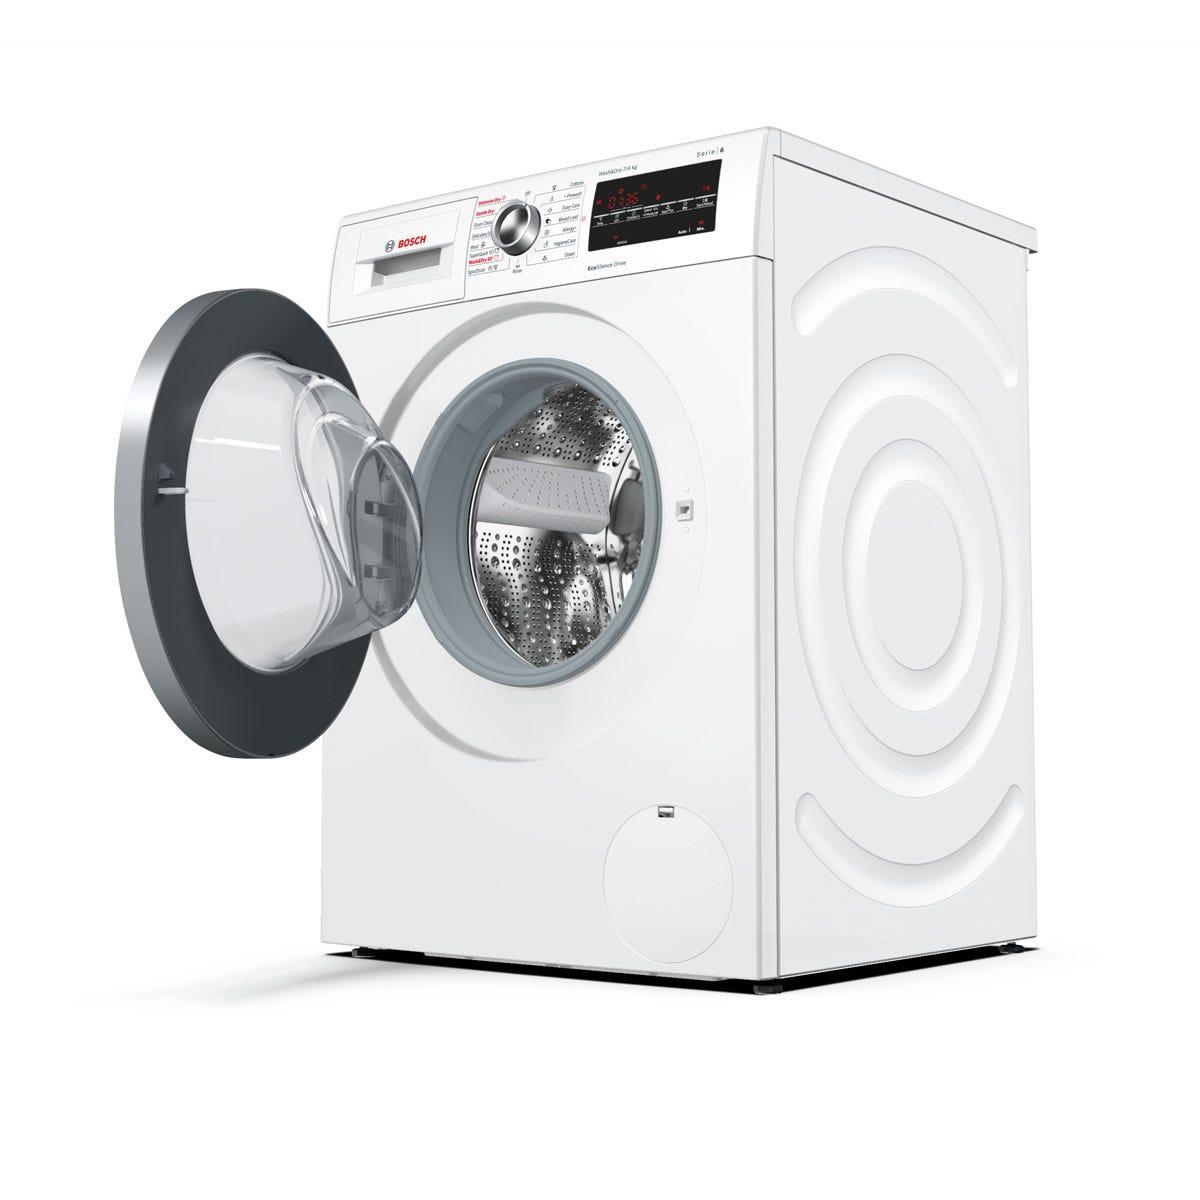 Bosch WVG30462GB Series 6 1500rpm Washer Dryer - White